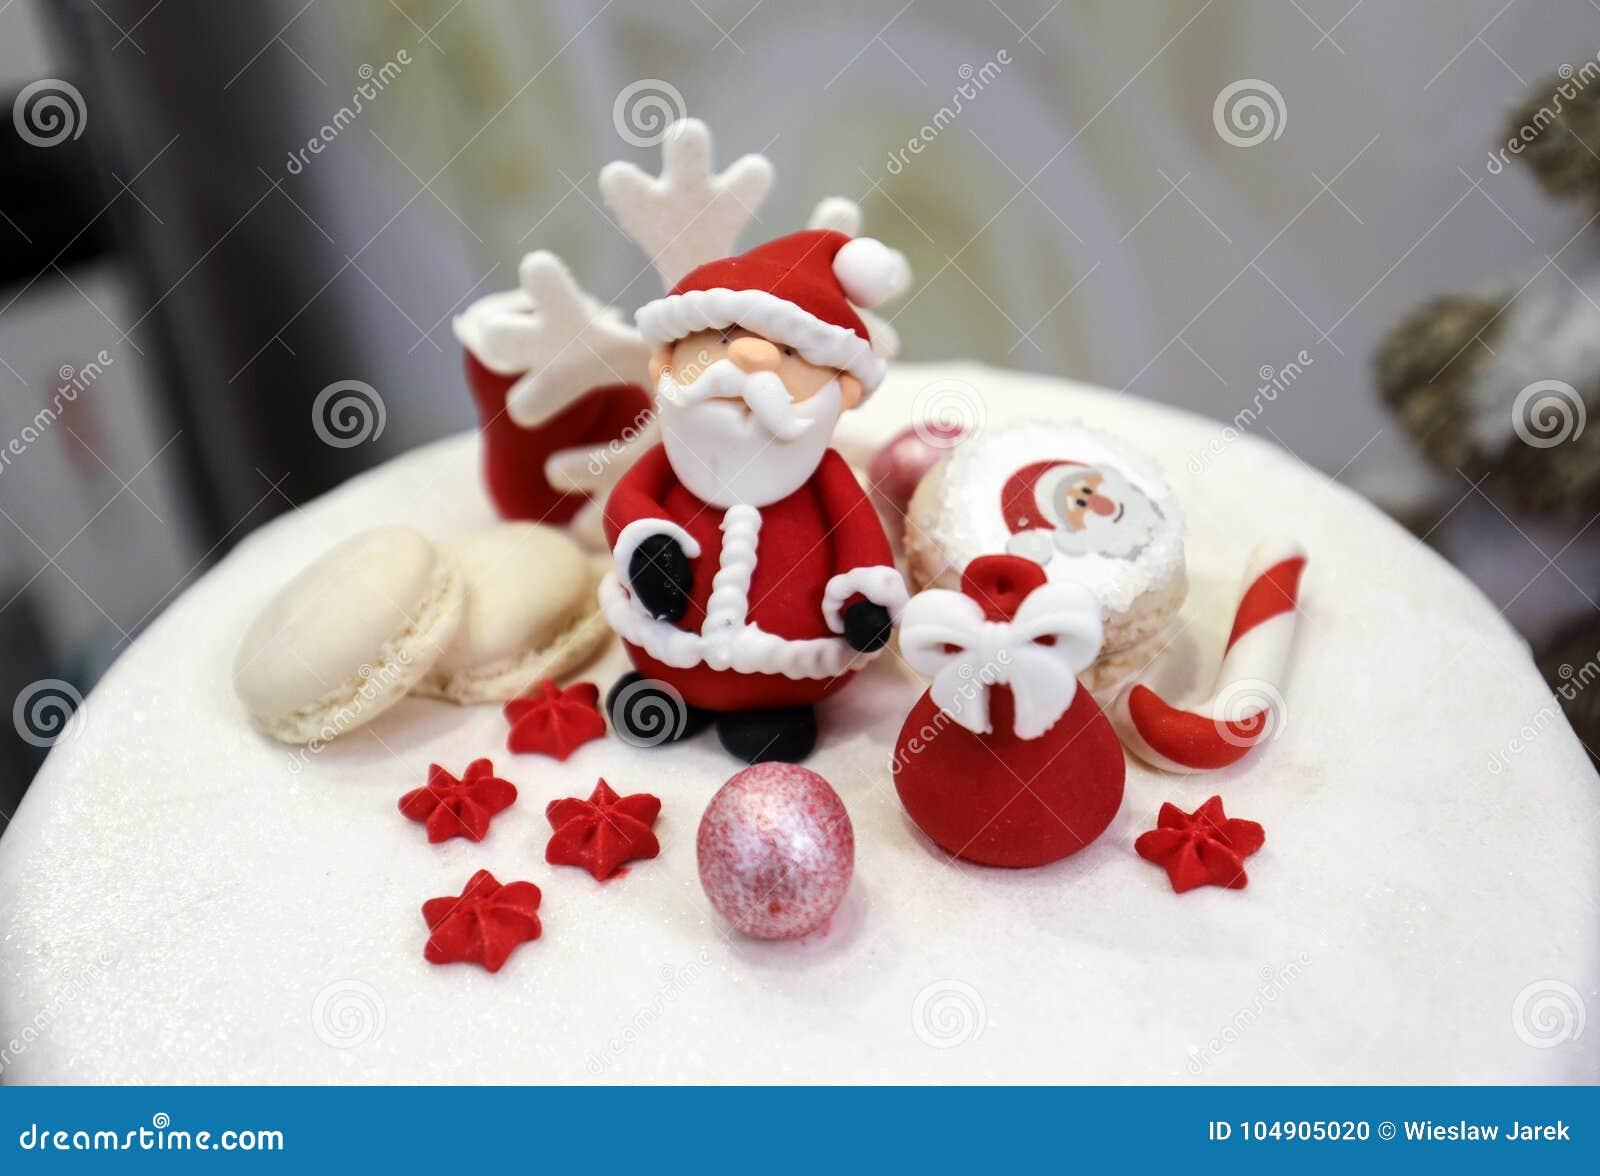 Sweet Sugar Santa Claus And Decorated Christmas Cookies Stock Photo